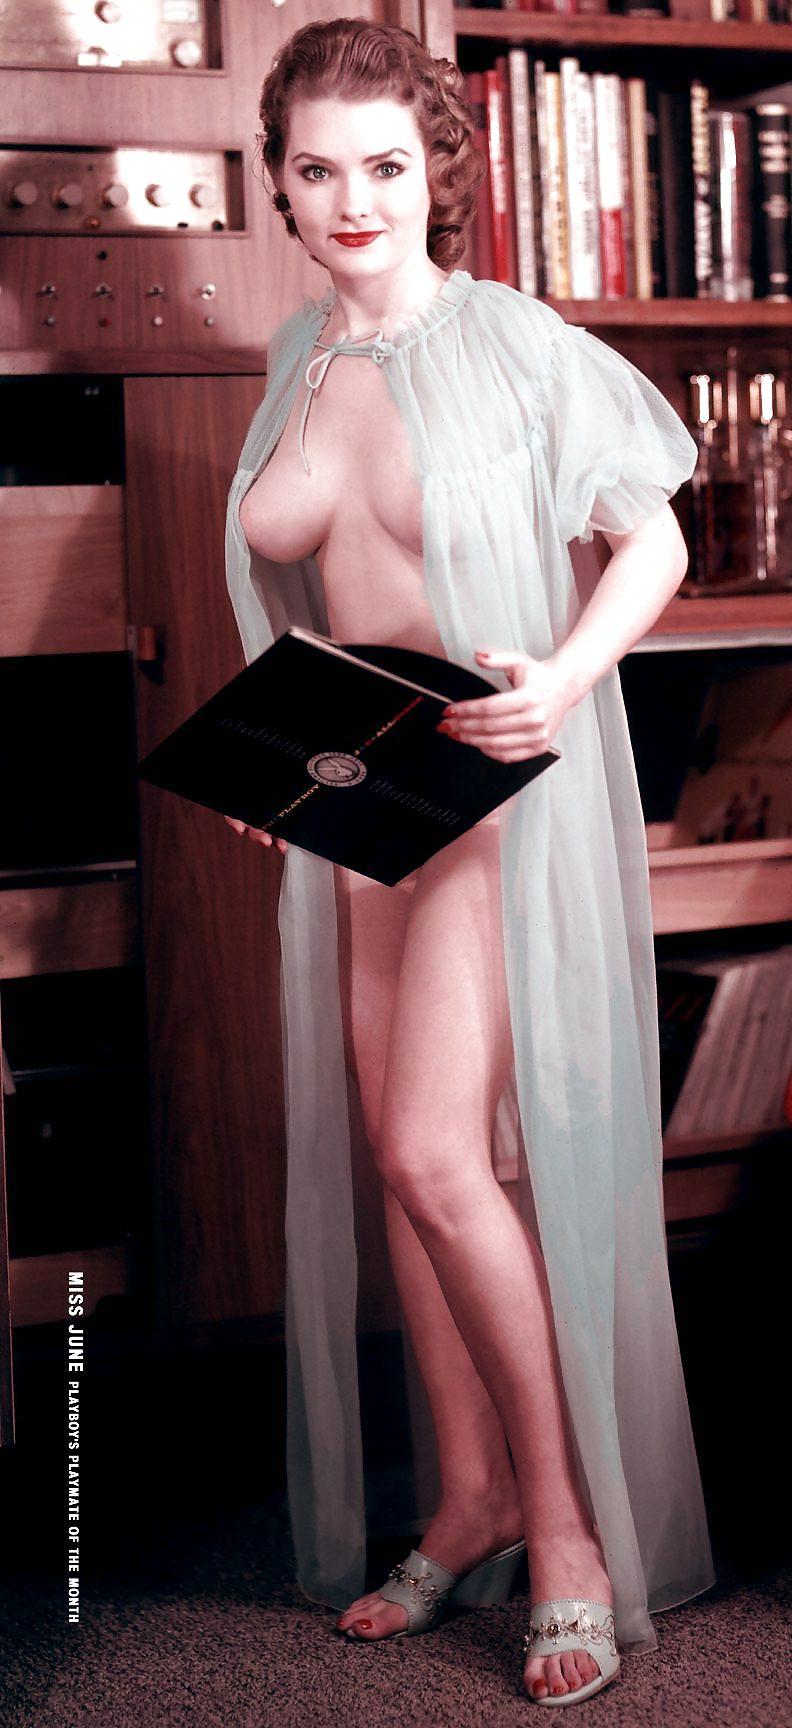 Stars Black Housewife Nude Gif